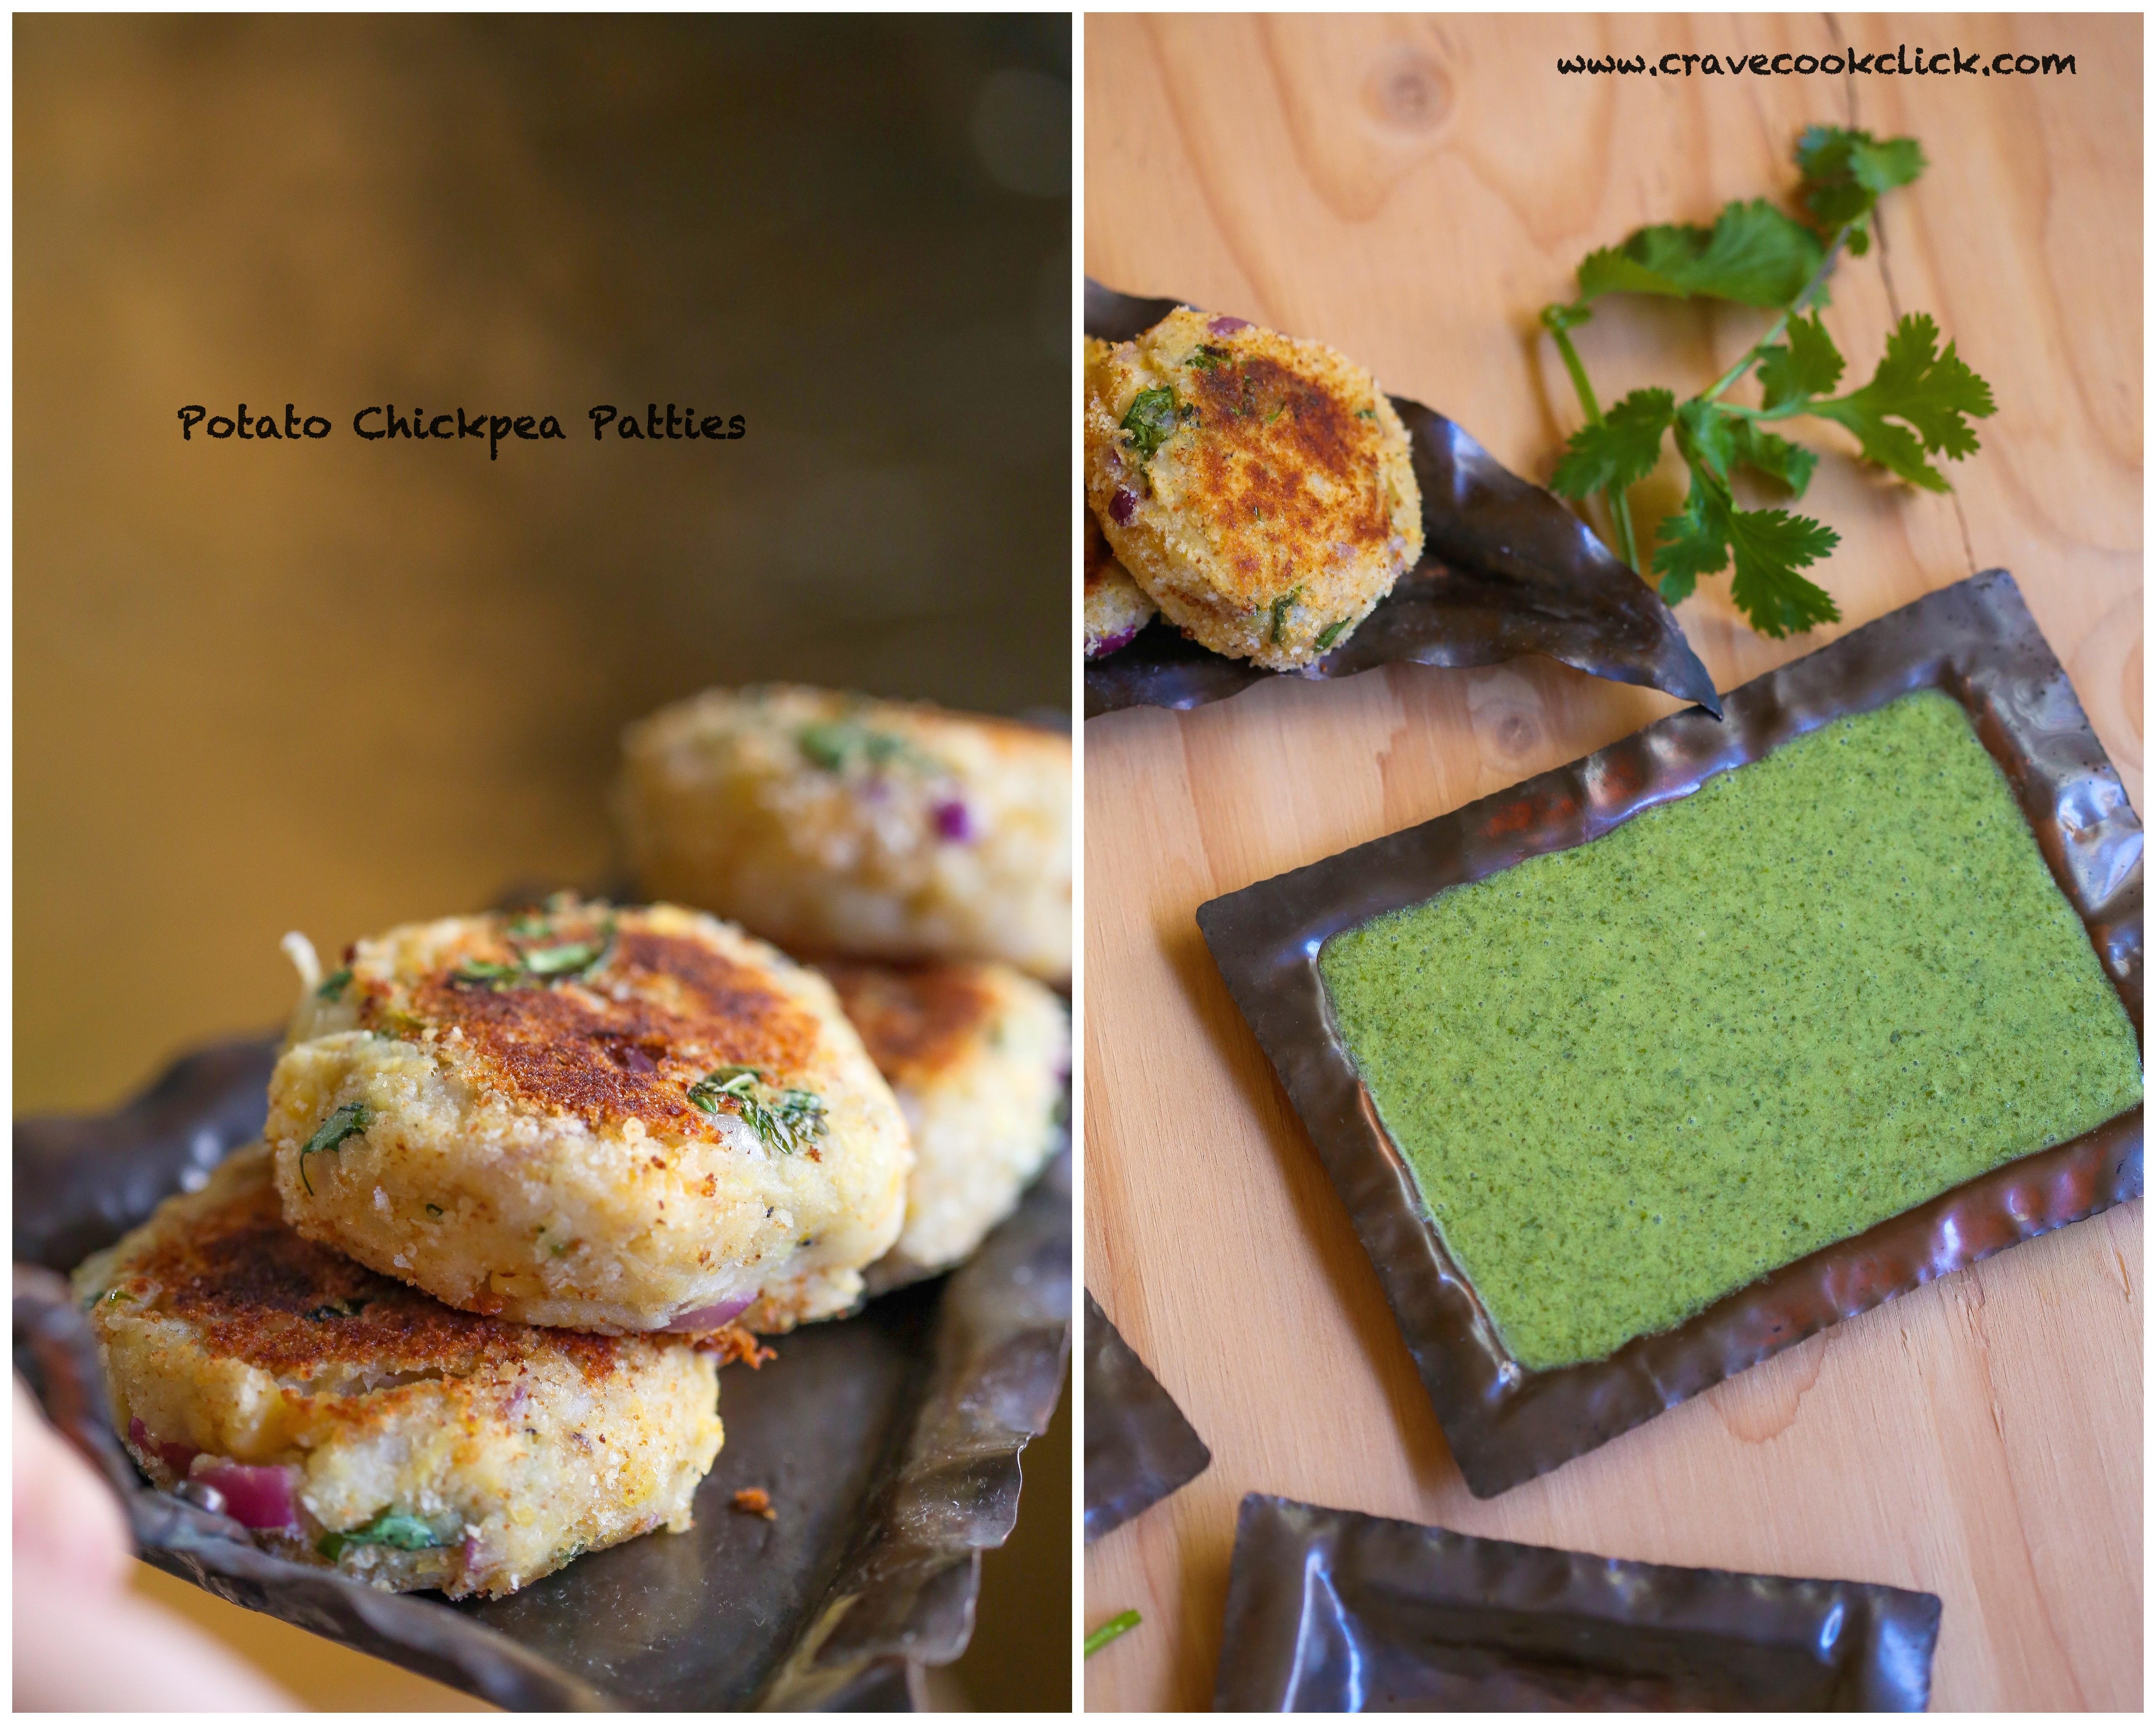 Potato patties/Chickpea Potato Sliders/How to make sliders